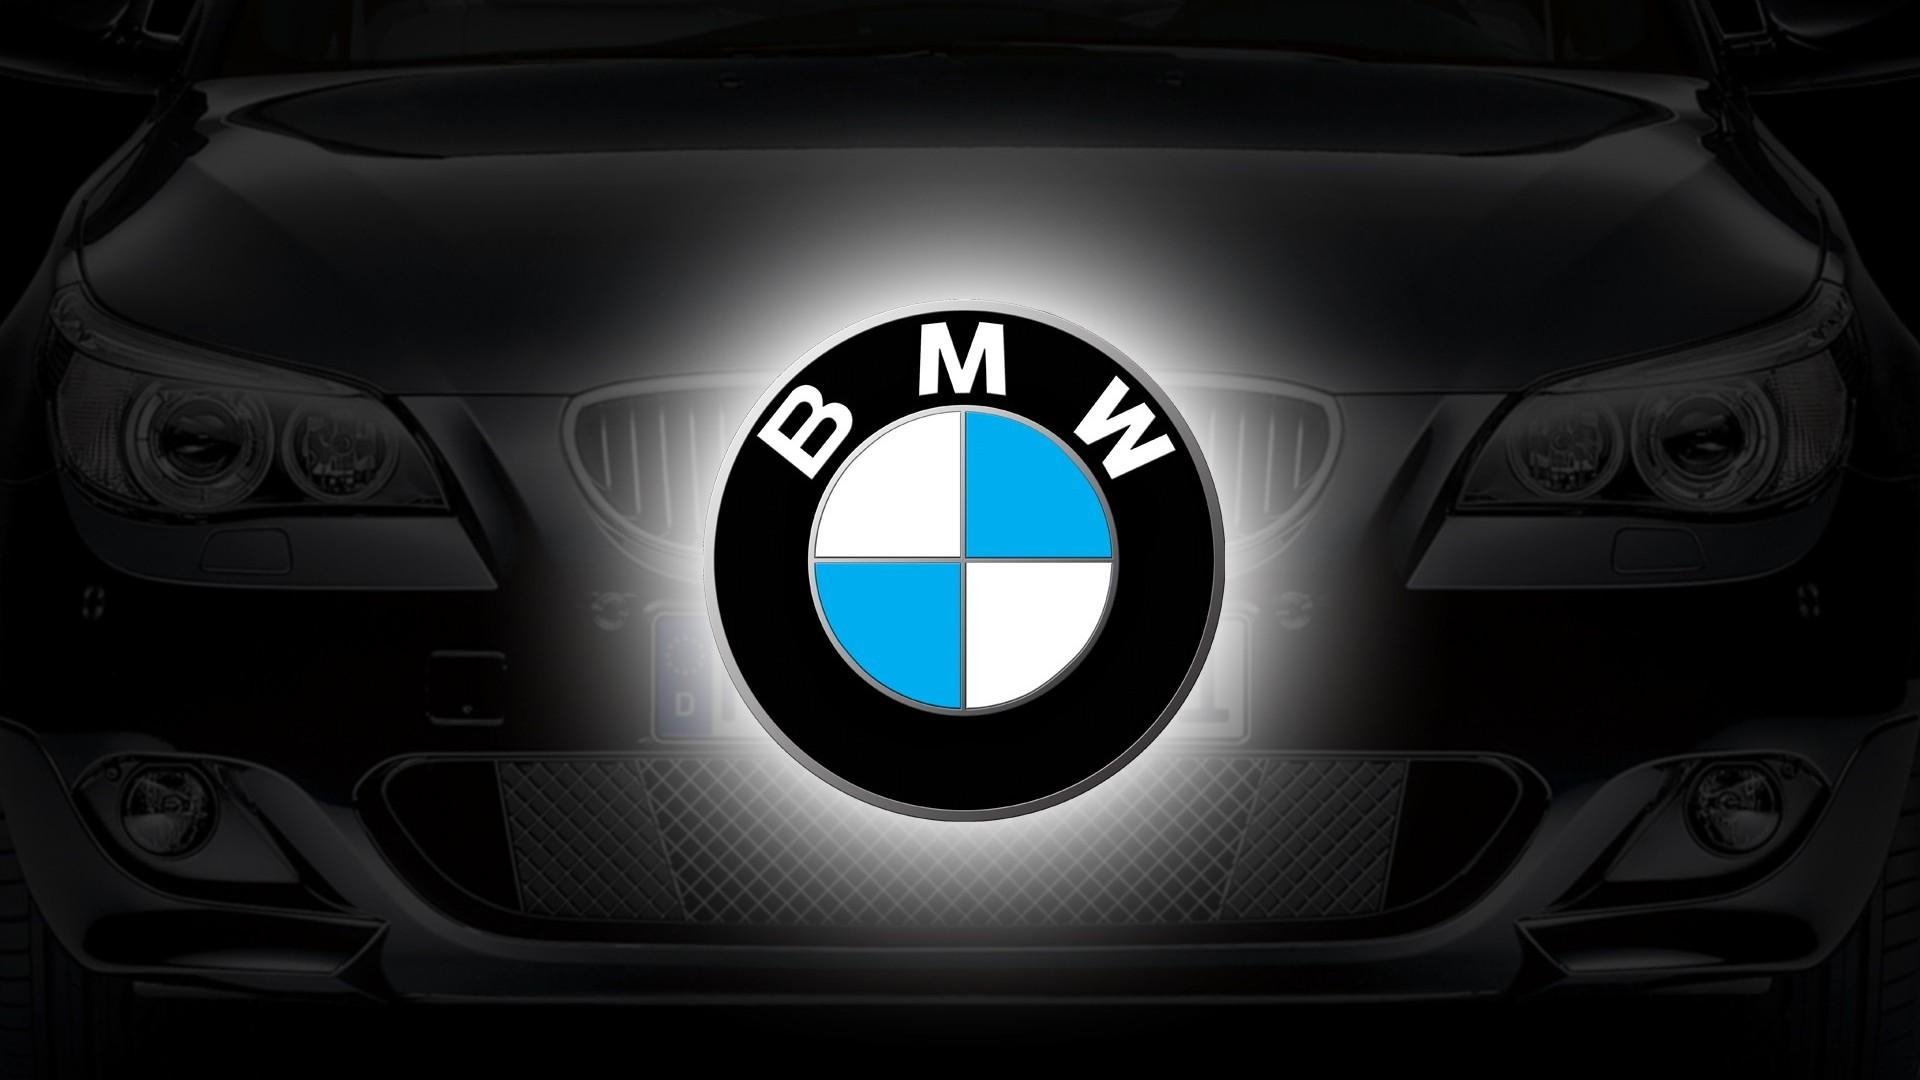 bmw-car-logo-design-background-hd-wallpaper